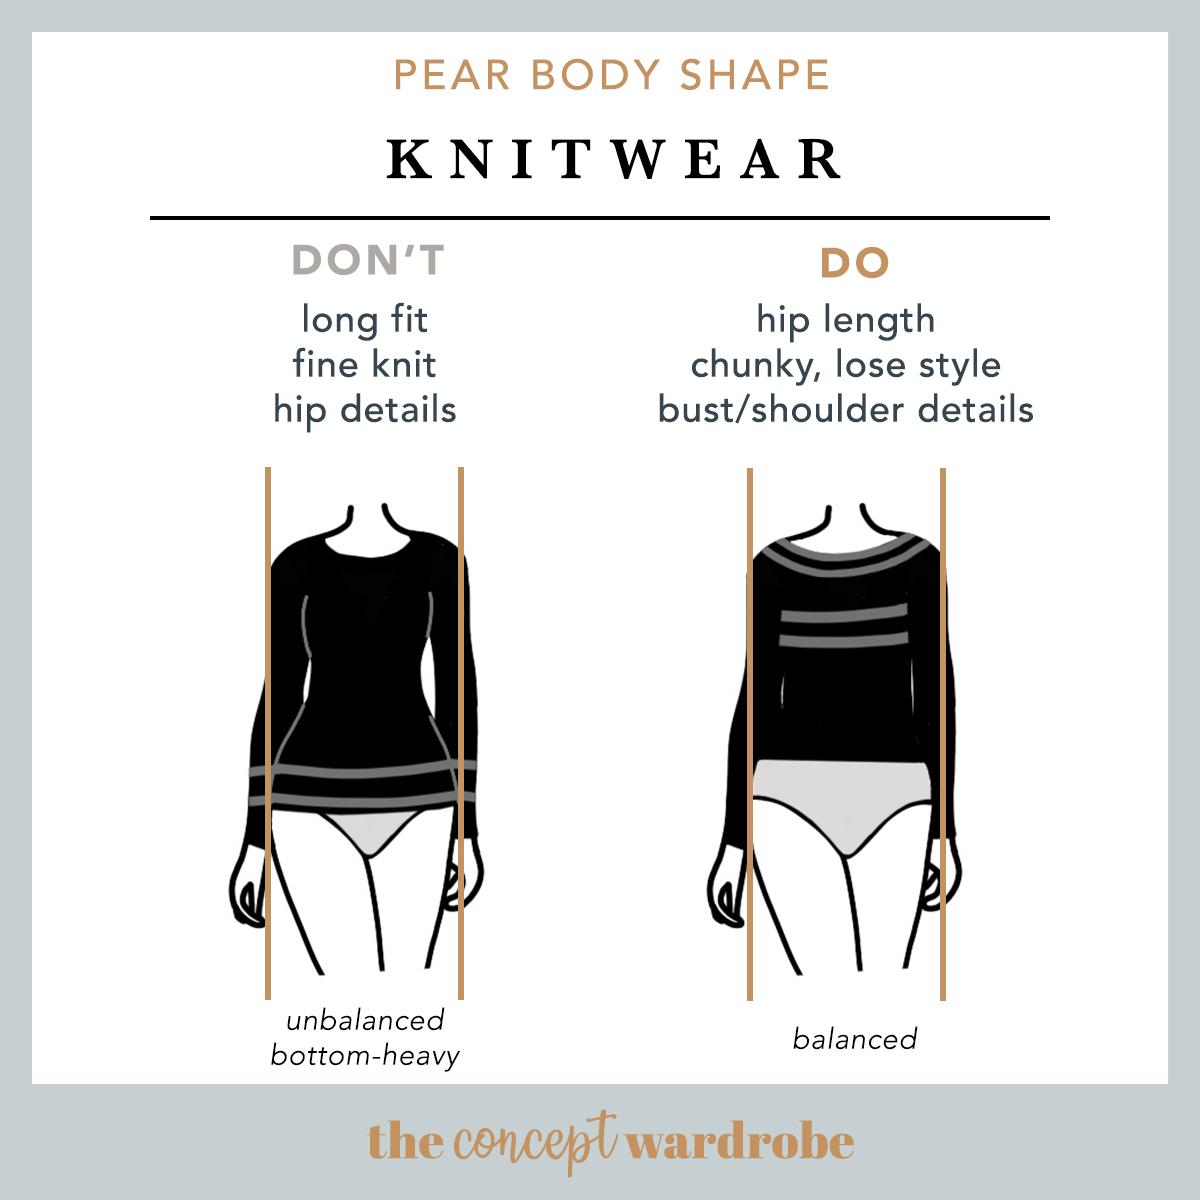 Pear Body Shape Knitwear Do's and Don'ts - the concept wardrobe